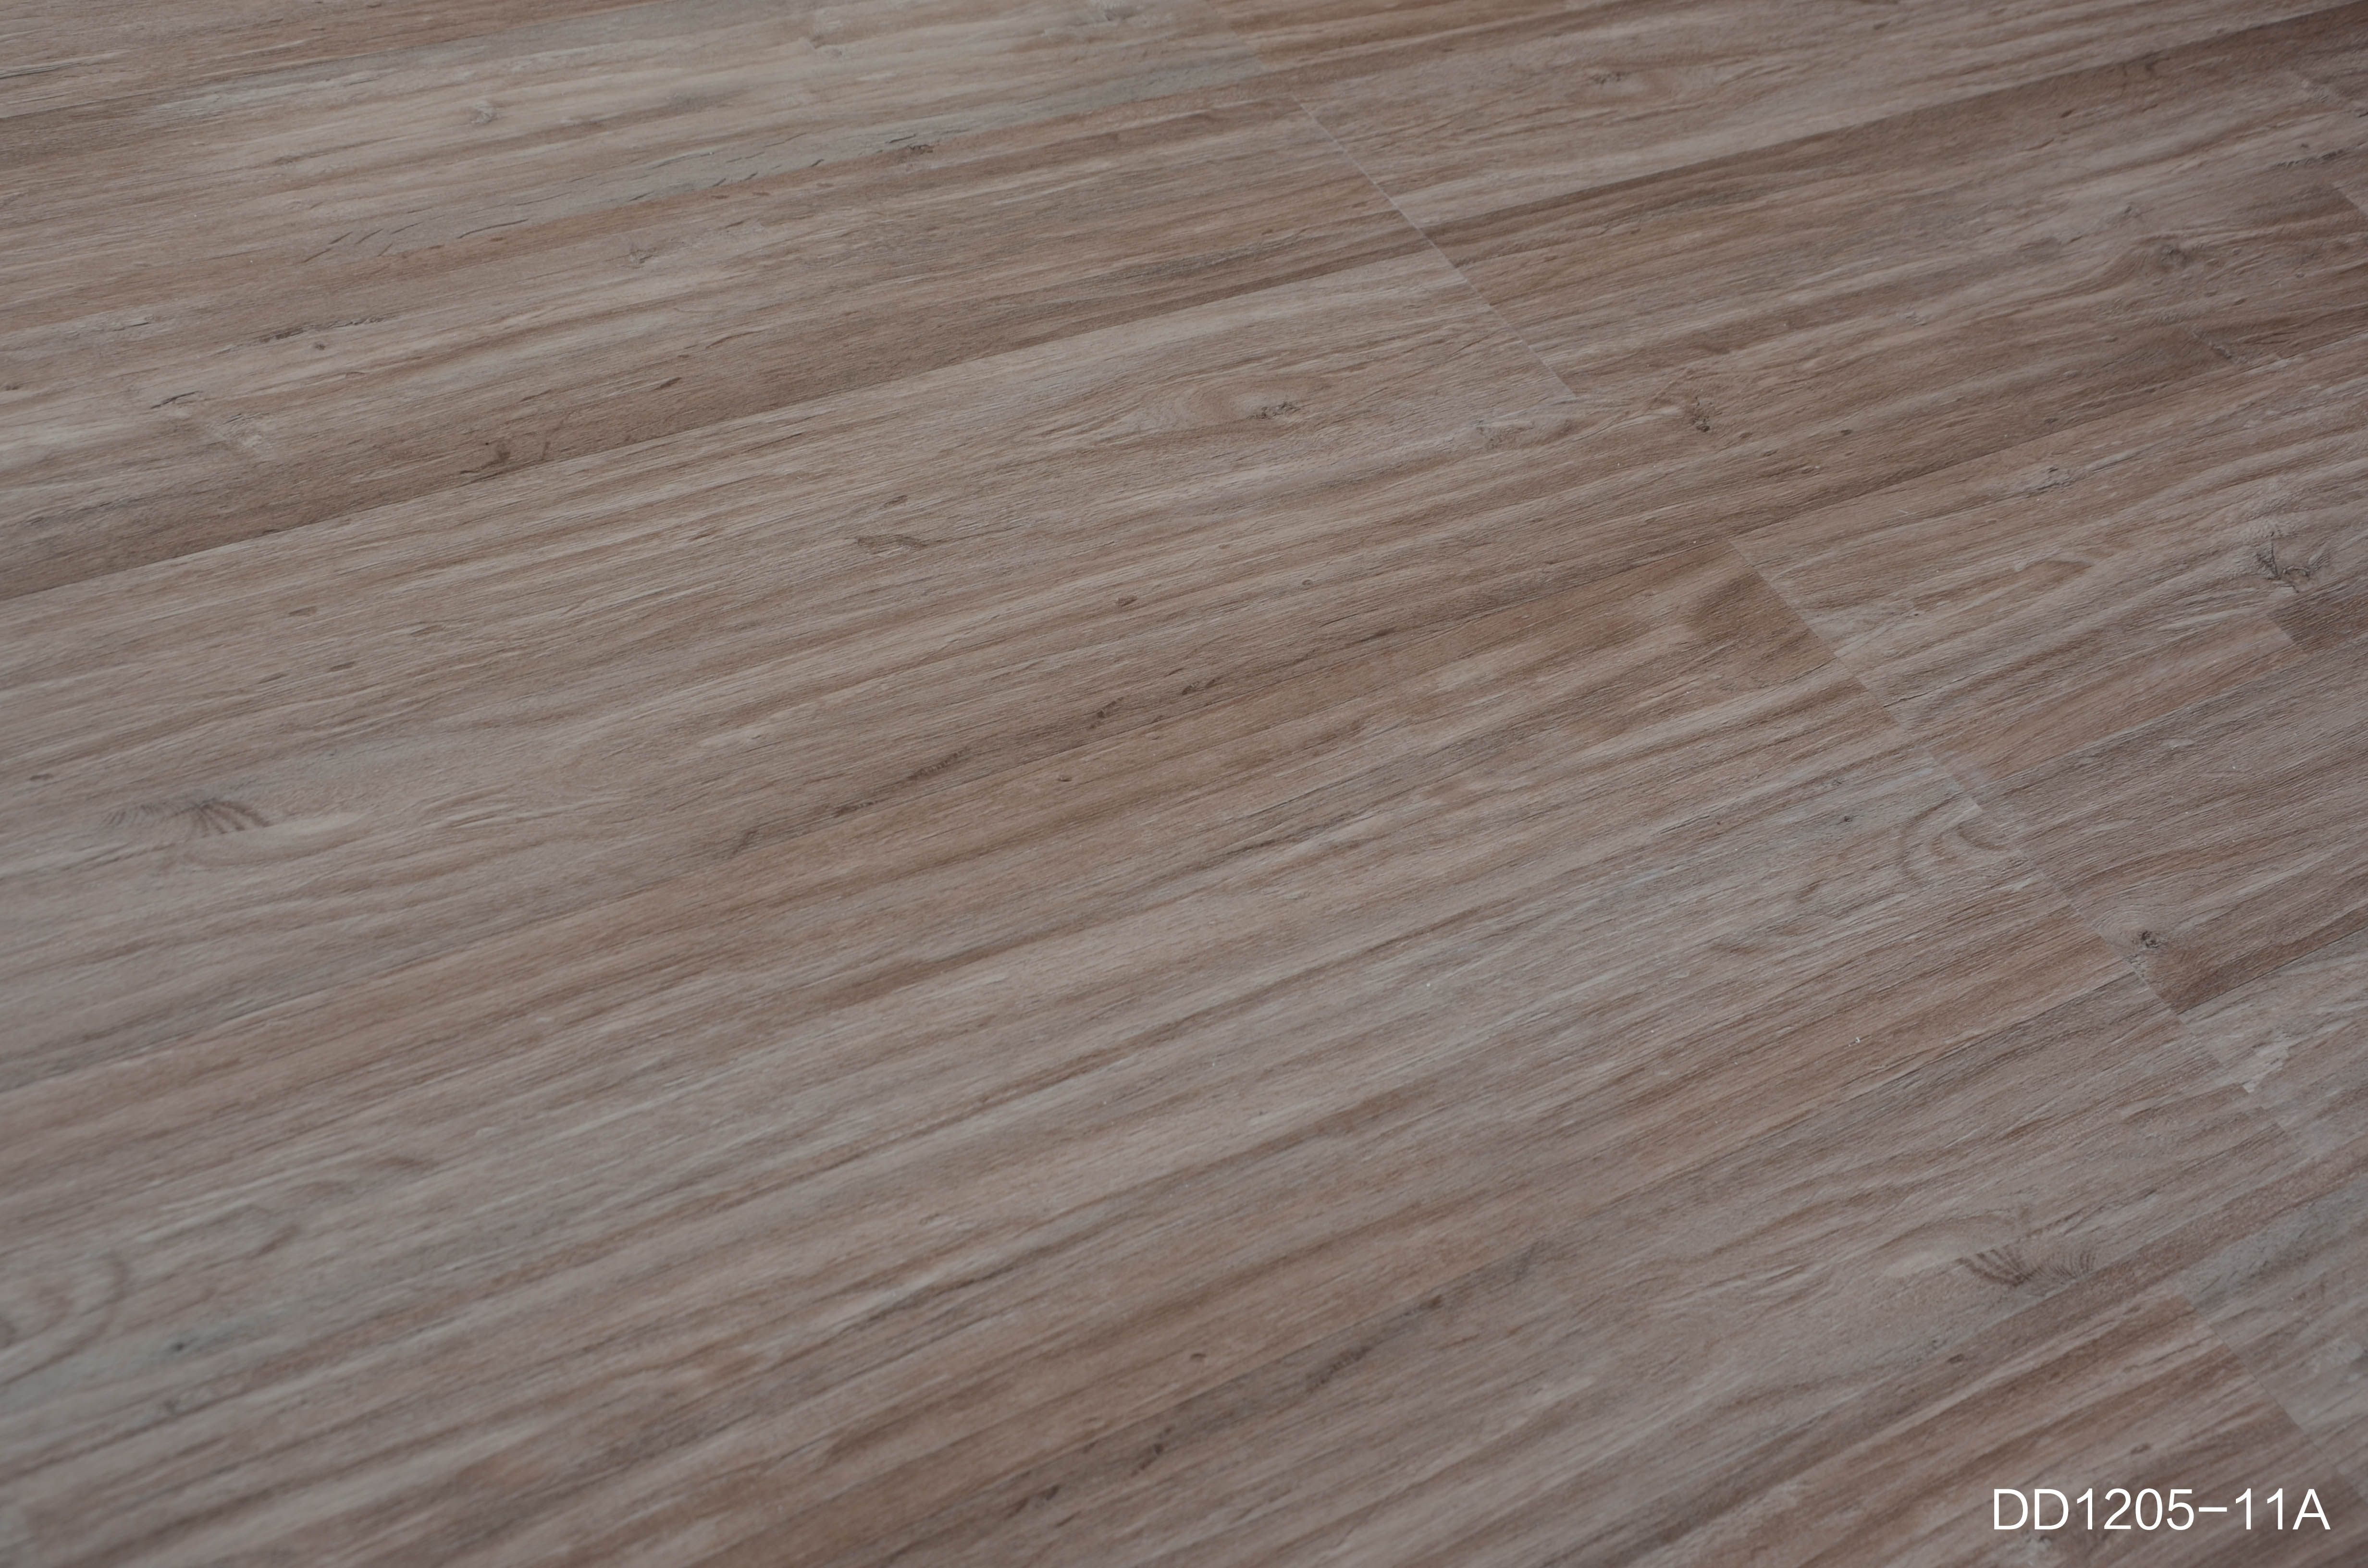 Rigid Core Vinyl Flooring In 2020 Vinyl Flooring Flooring Luxury Vinyl Flooring